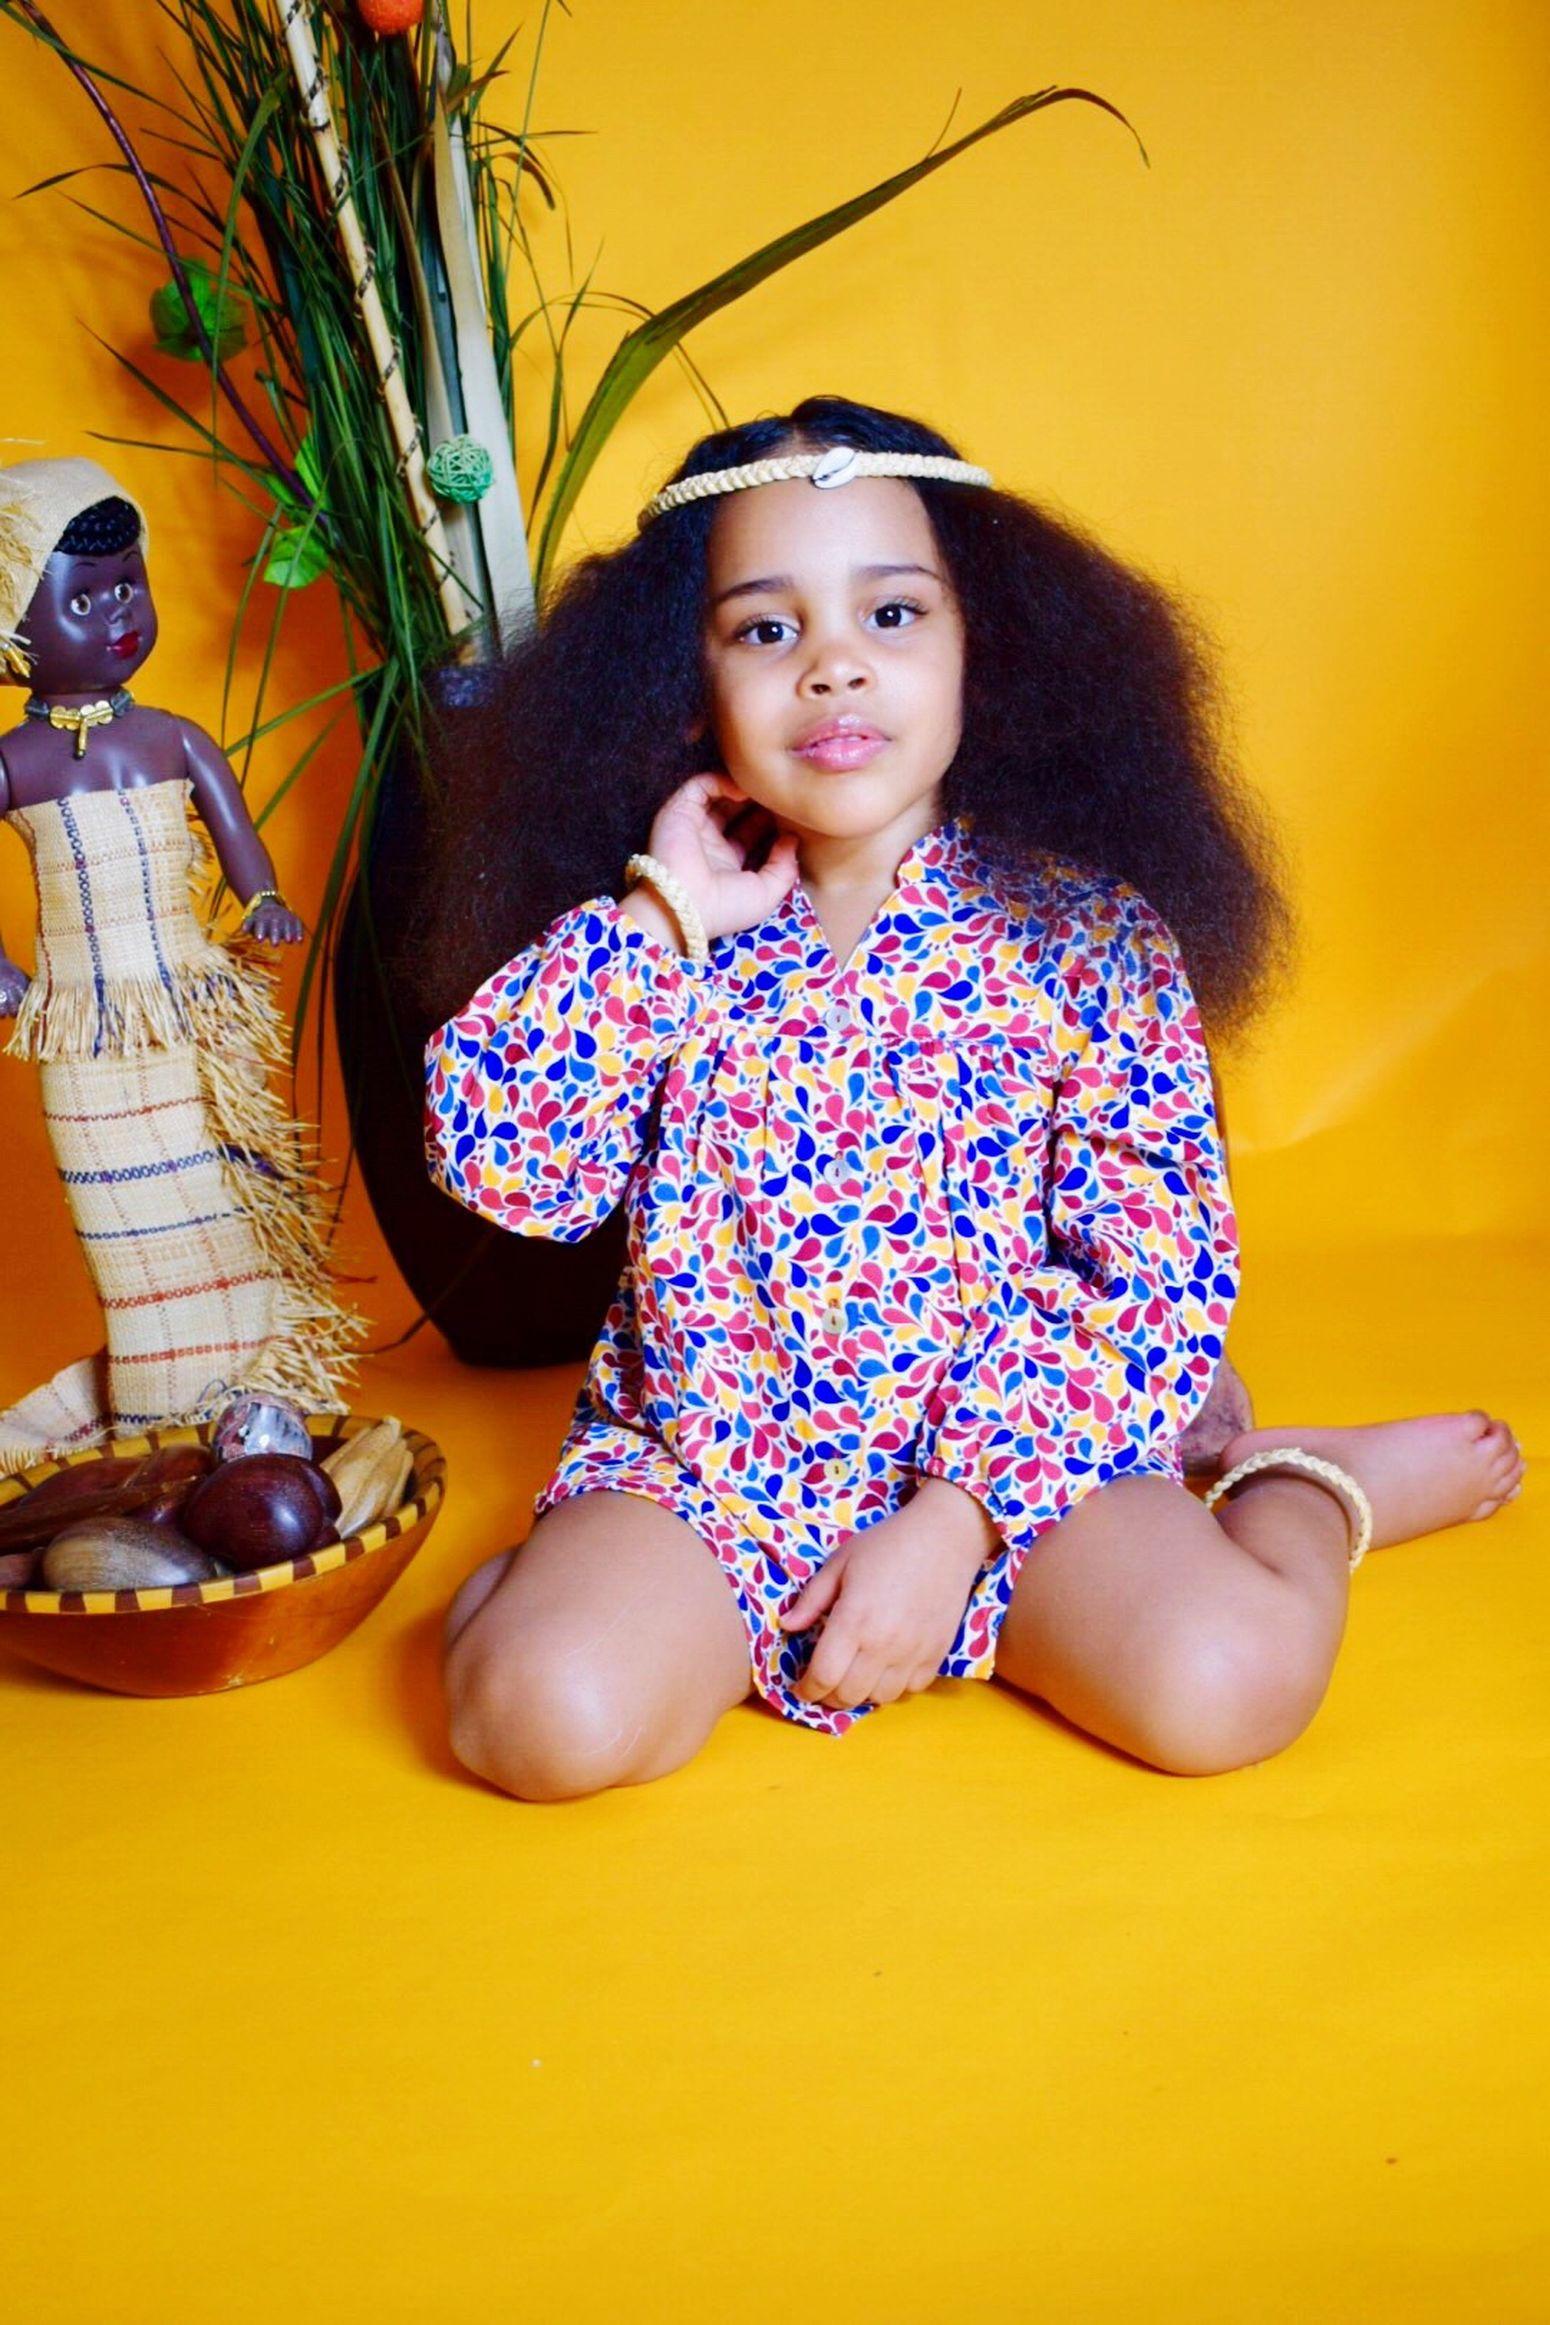 Anina Gabon (null)Childhood Girls Indoors  Portrait Looking At Camera Studio Shot Lifestyles Mixedchild Childmodel